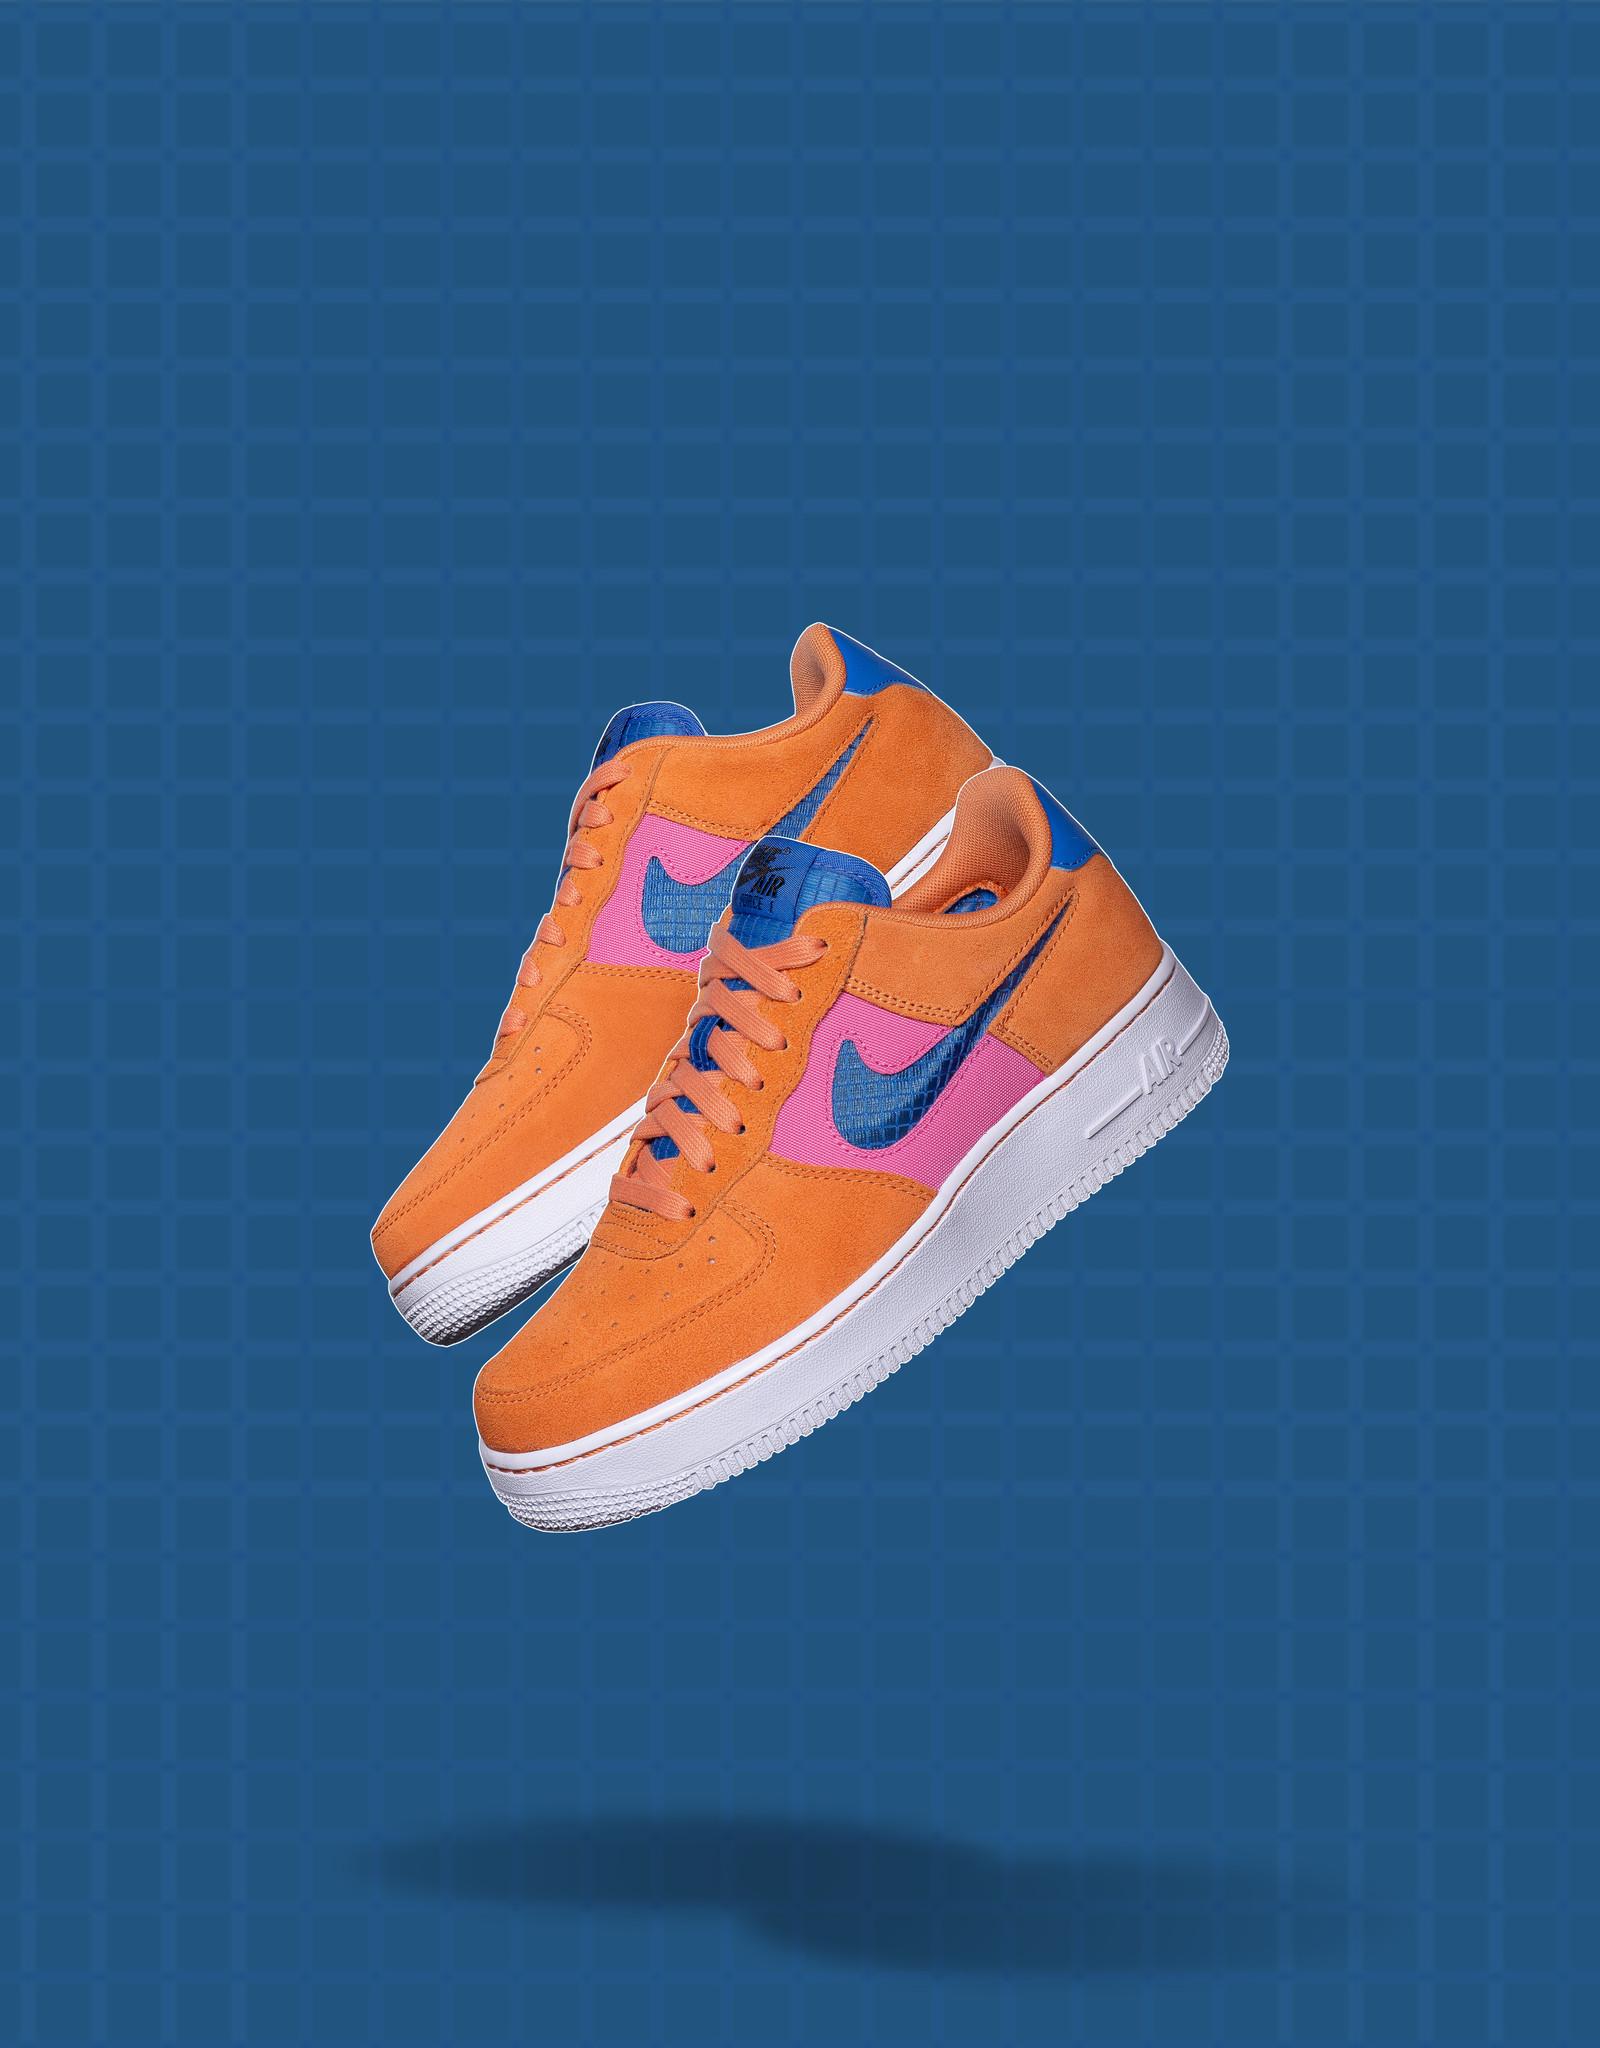 Nike Air Force 1 '07 LV8 Orange/Pacific Blue